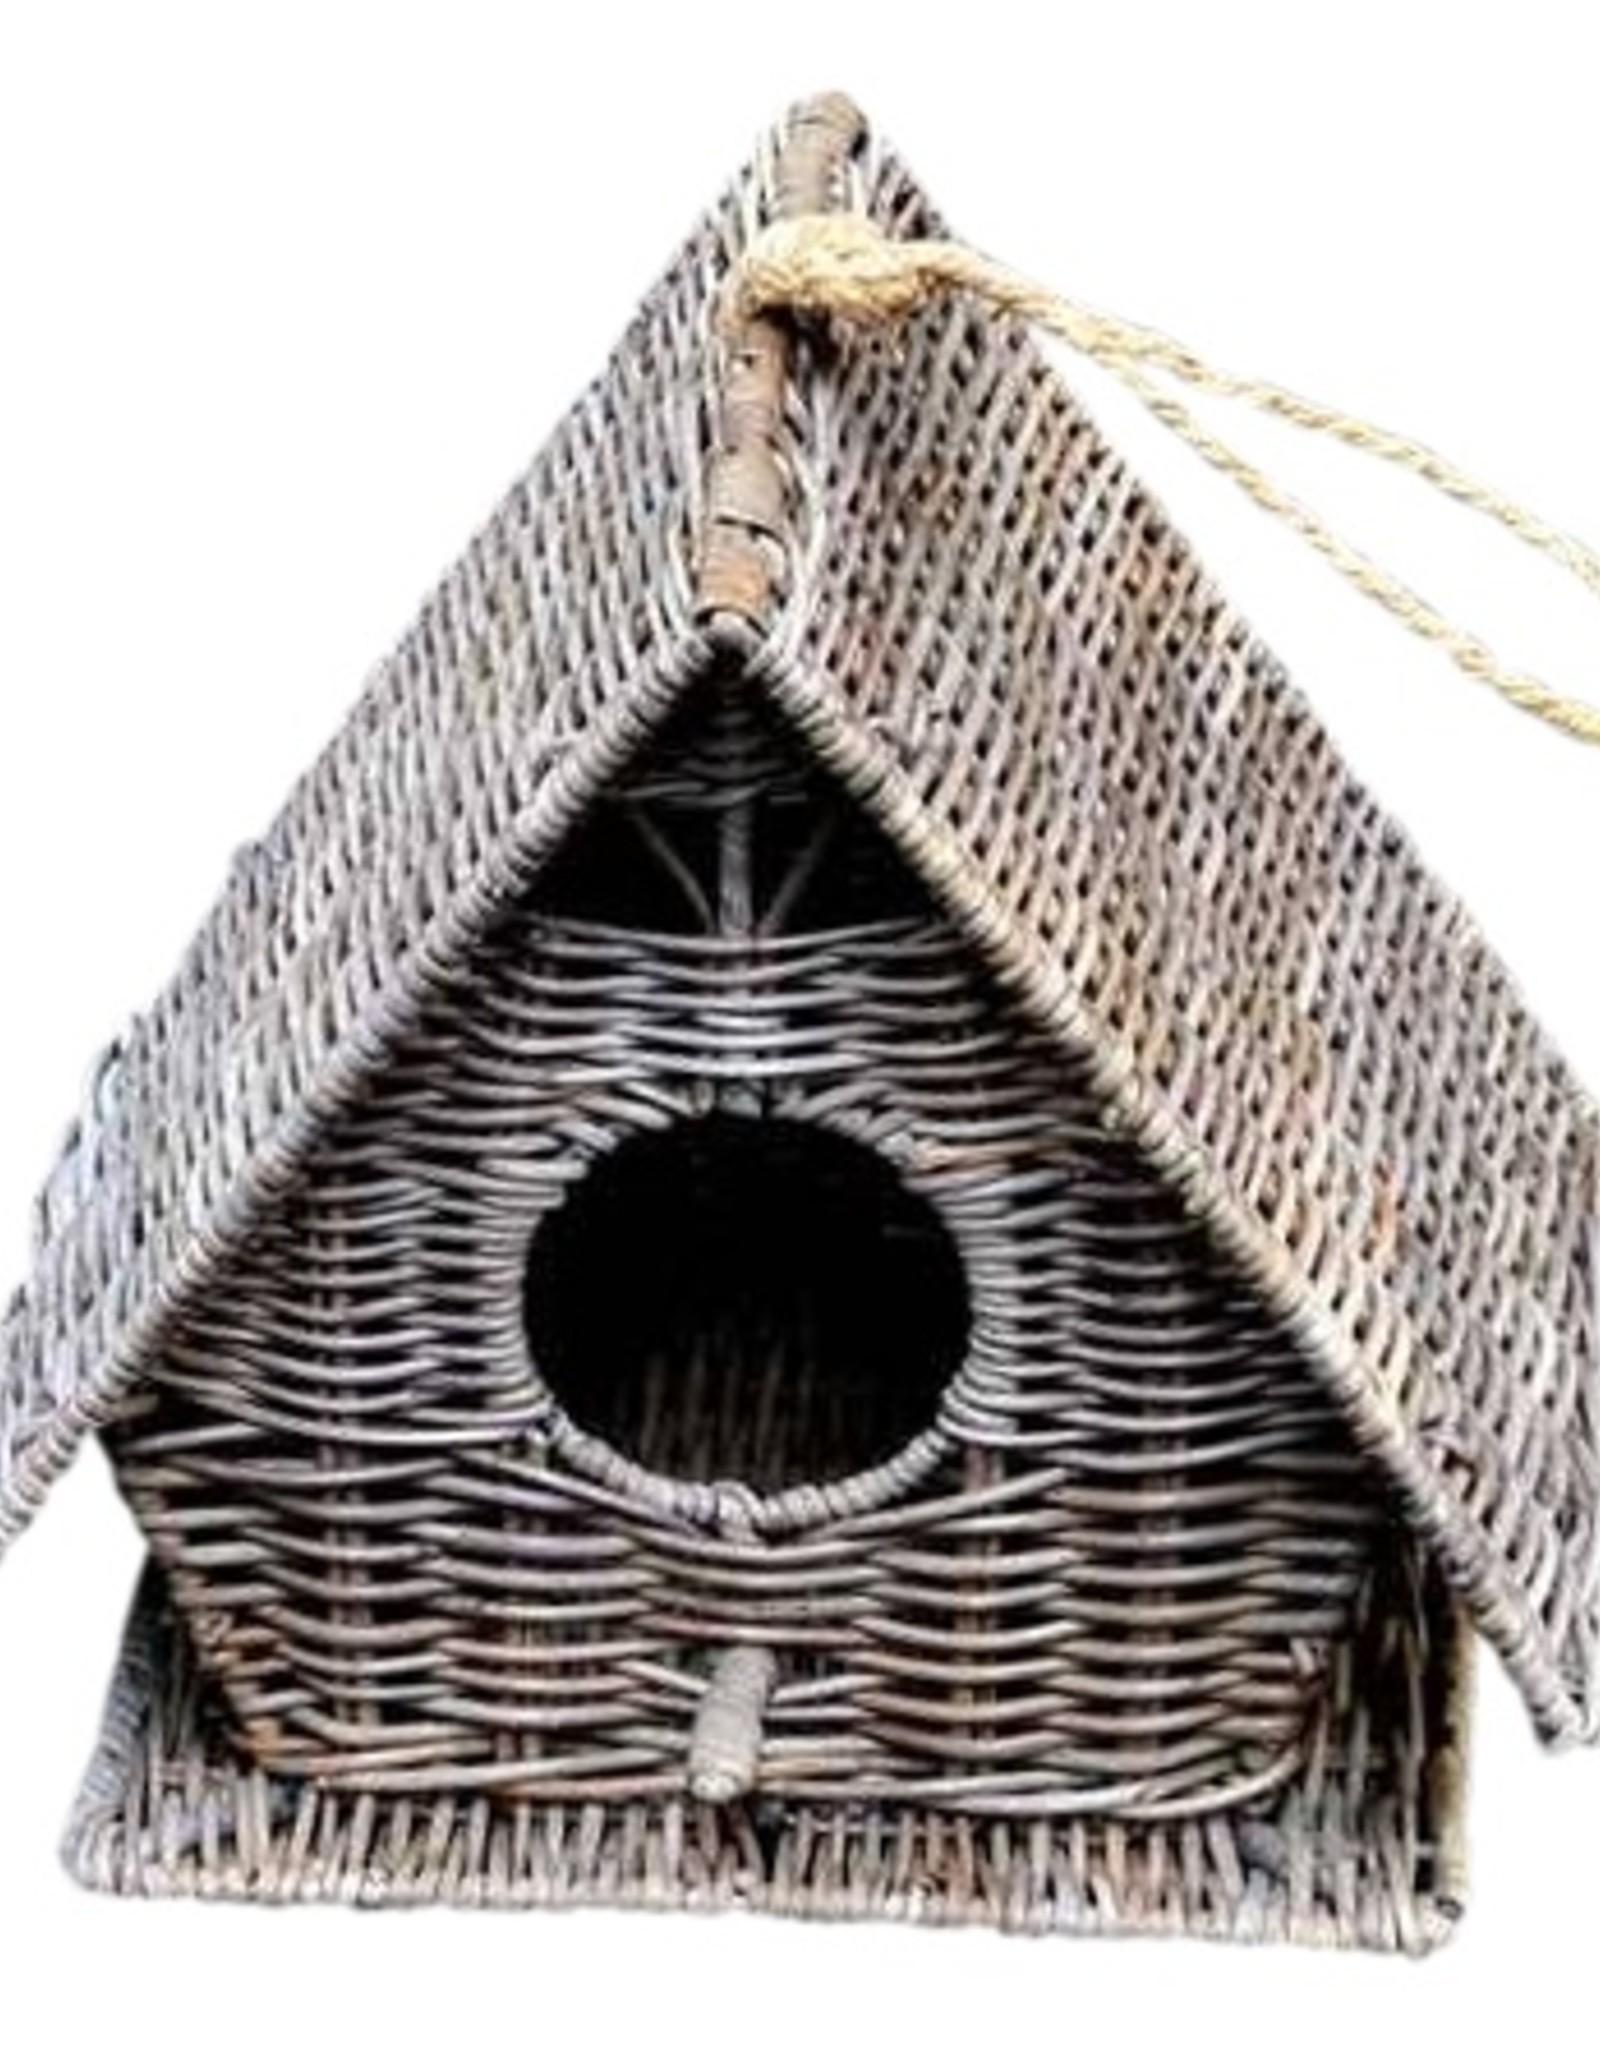 Birdhouse (GSR-008 002)